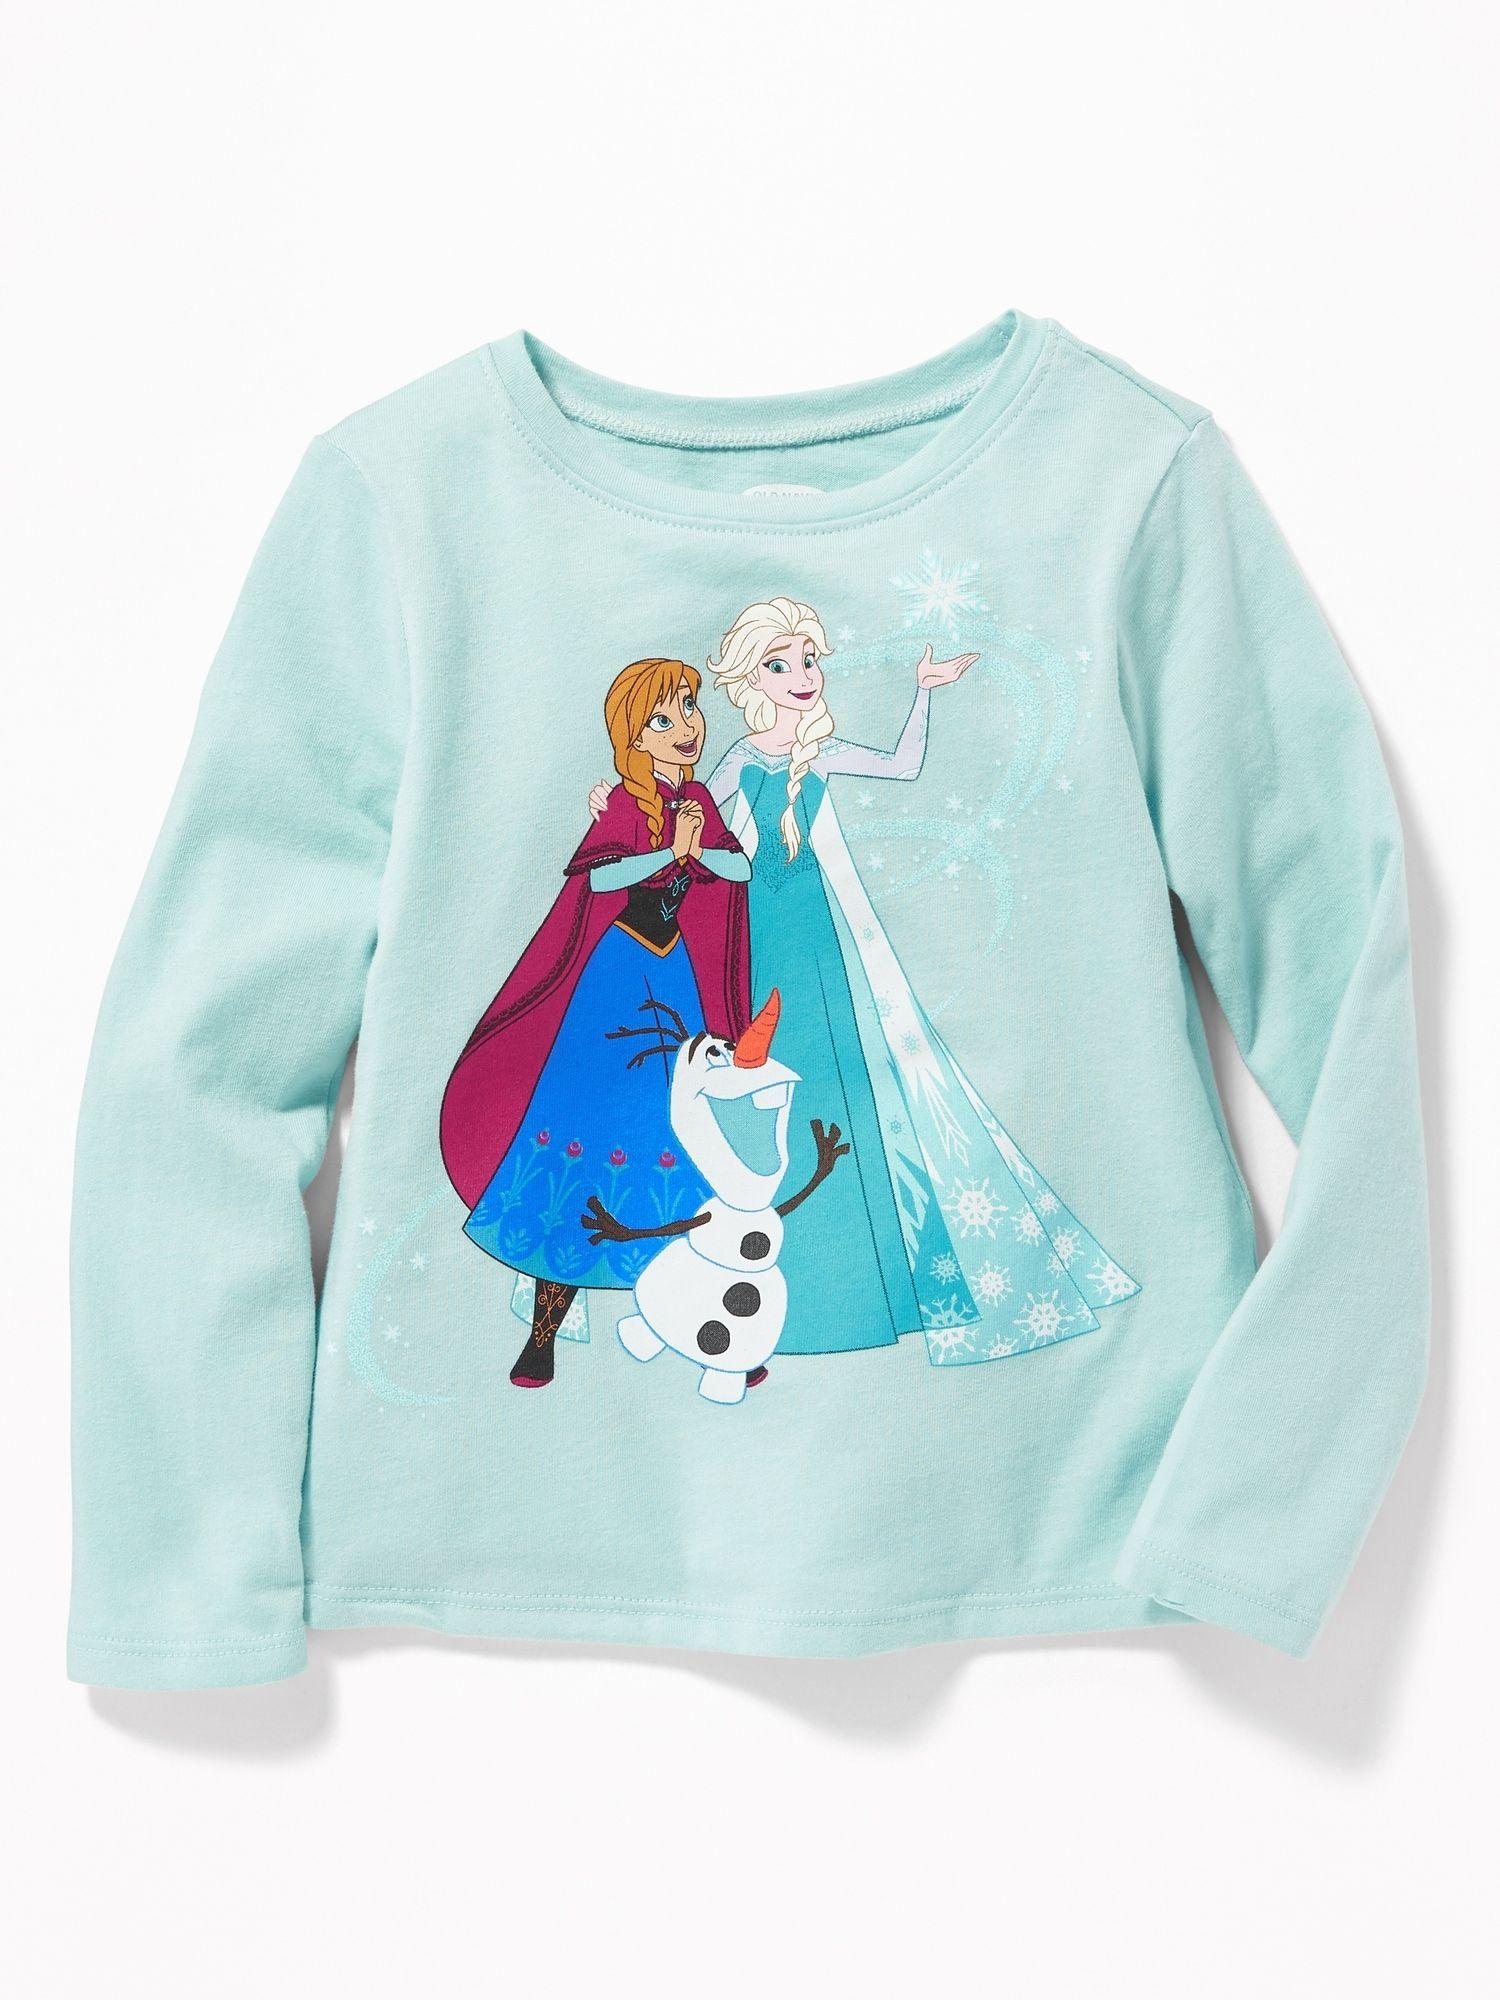 Disney C Frozen Graphic Tee For Toddler Girls Old Navy Old Navy Old Navy Girls Shop Old Navy [ 2000 x 1500 Pixel ]